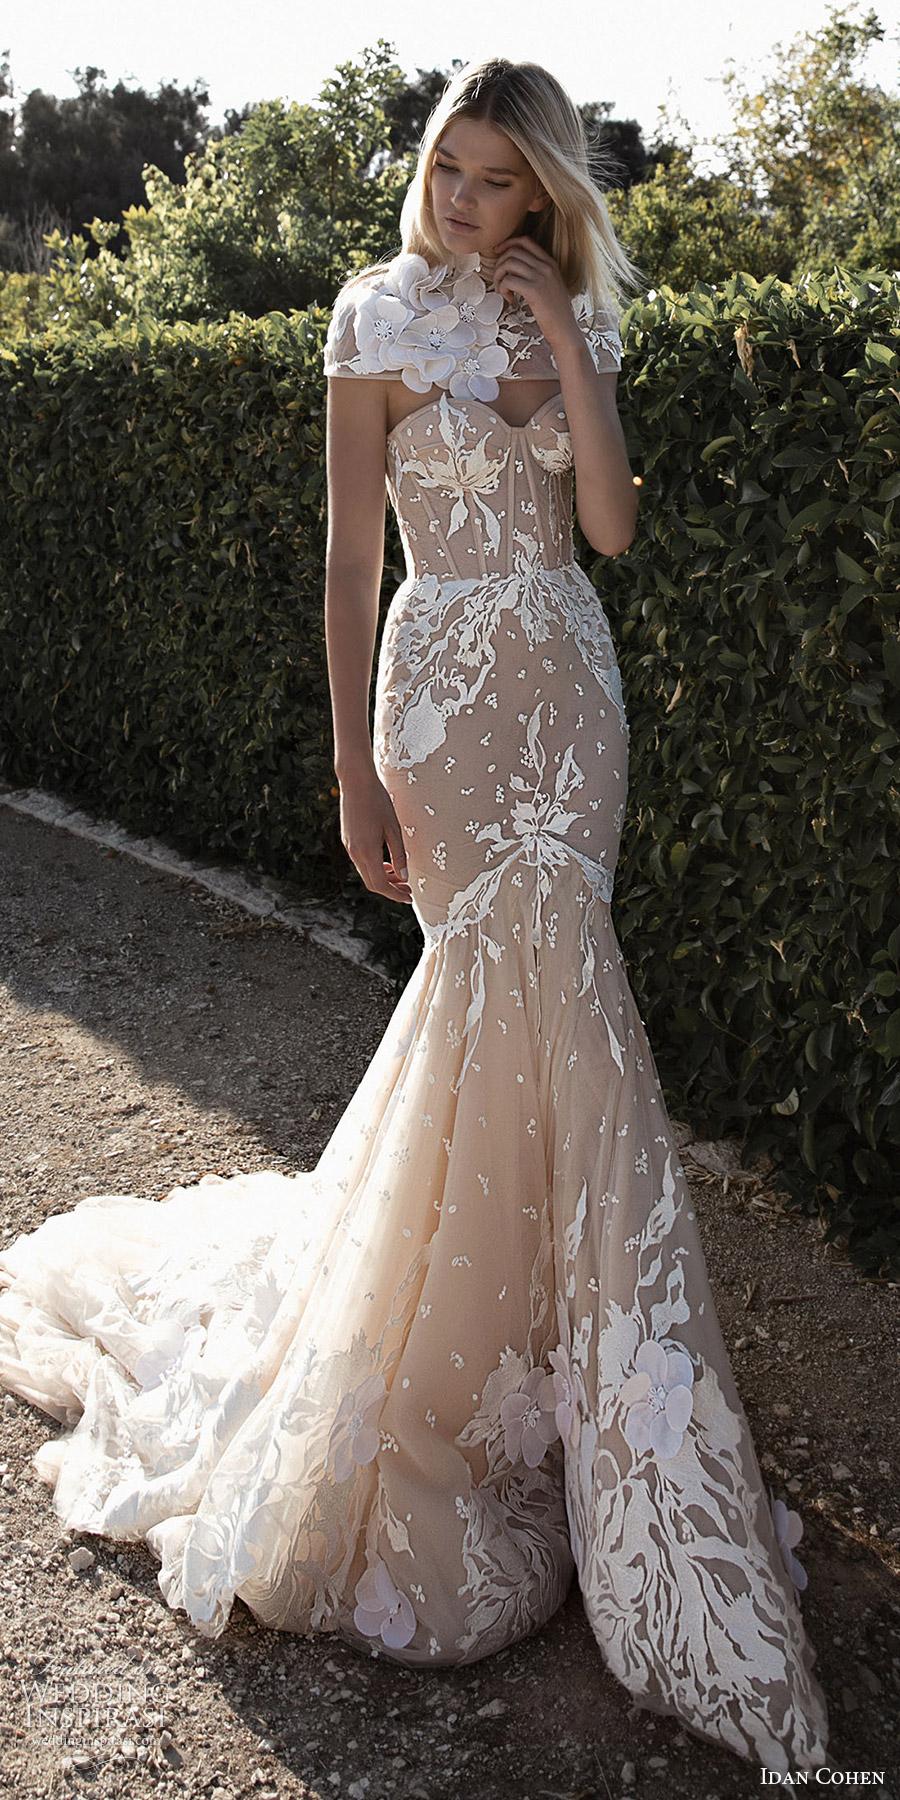 vestido de novia Idan Cohen 2017 sin tirantes de boda del amor de la sirena (Emily Mercedes) fv capelet